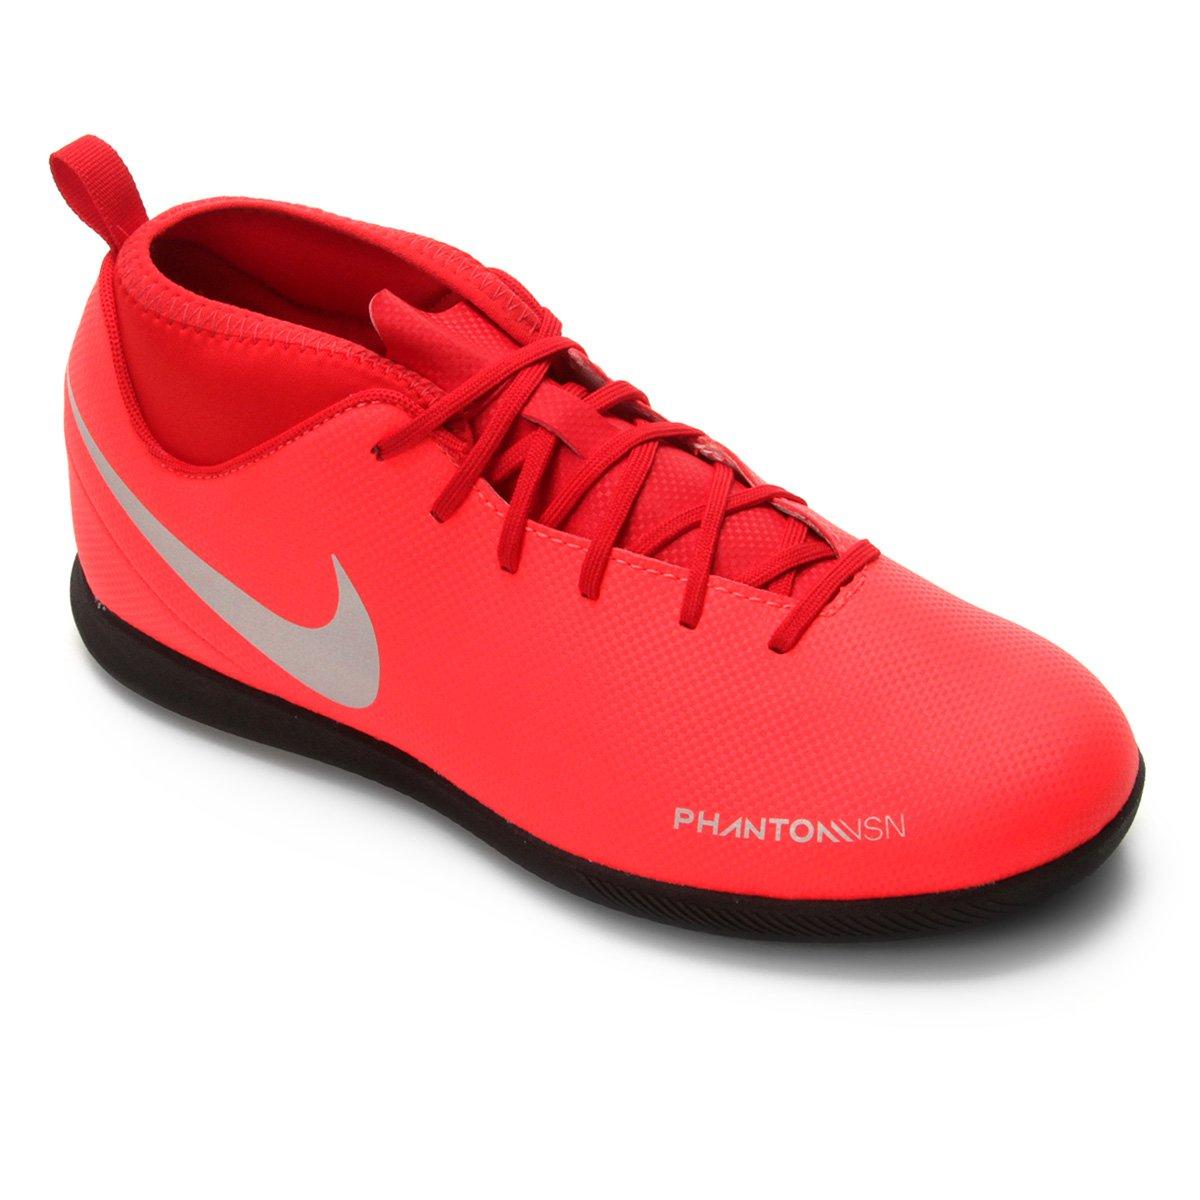 Chuteira Futsal Infantil Nike Phantom Vision Club DF IC - Vermelho e ... 61c3ad7a3c6c4